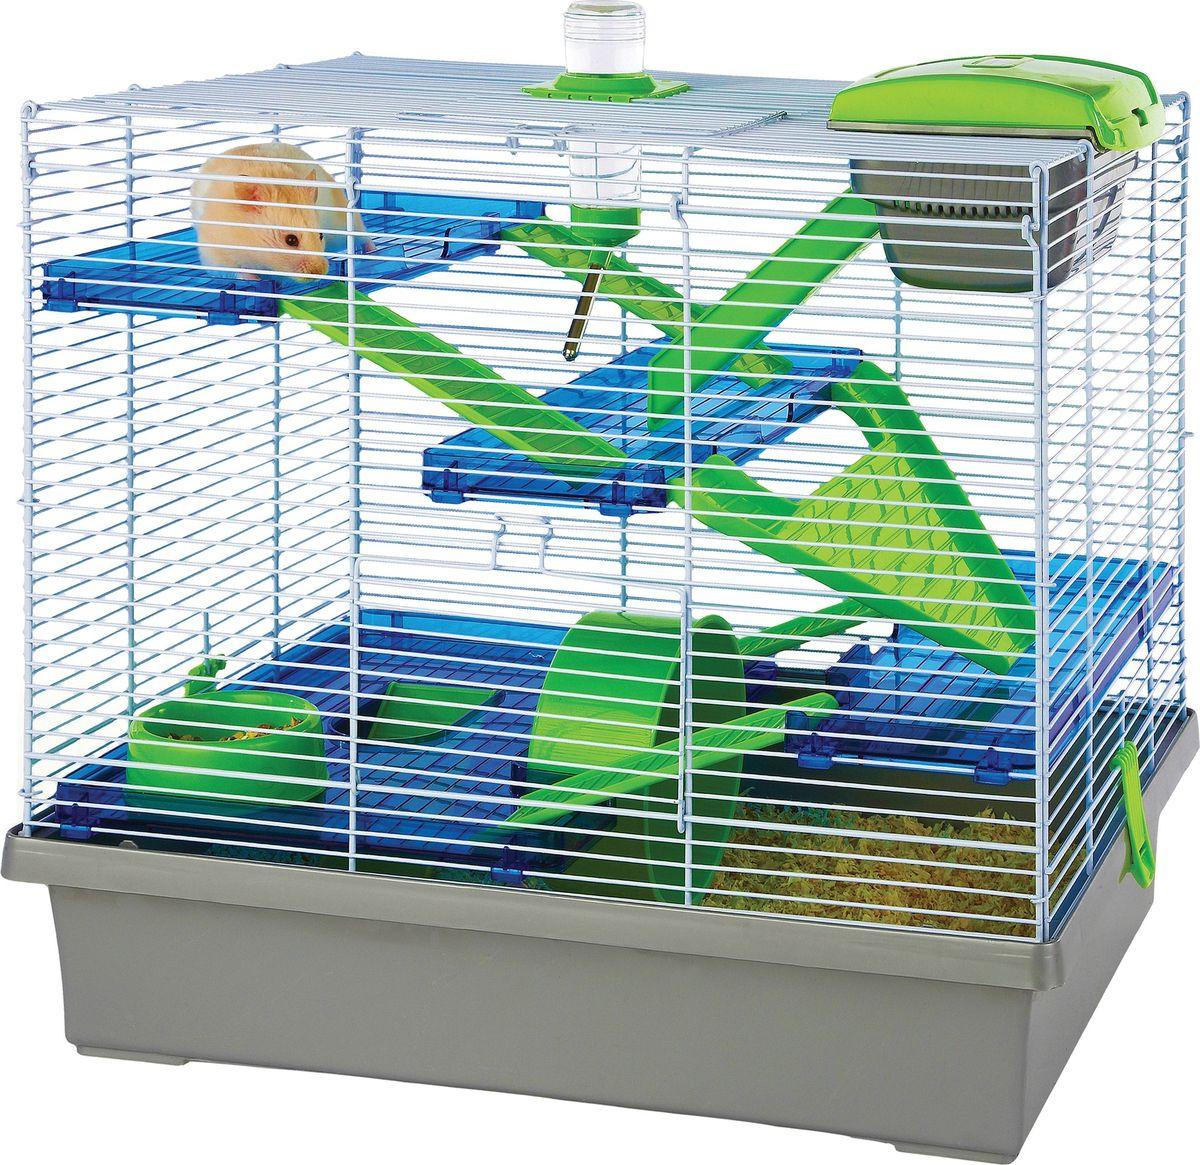 Клетка для грызунов Fauna International Pico, цвет: серебристый, зеленый, 50 х 36 х 45 см dali zensor pico